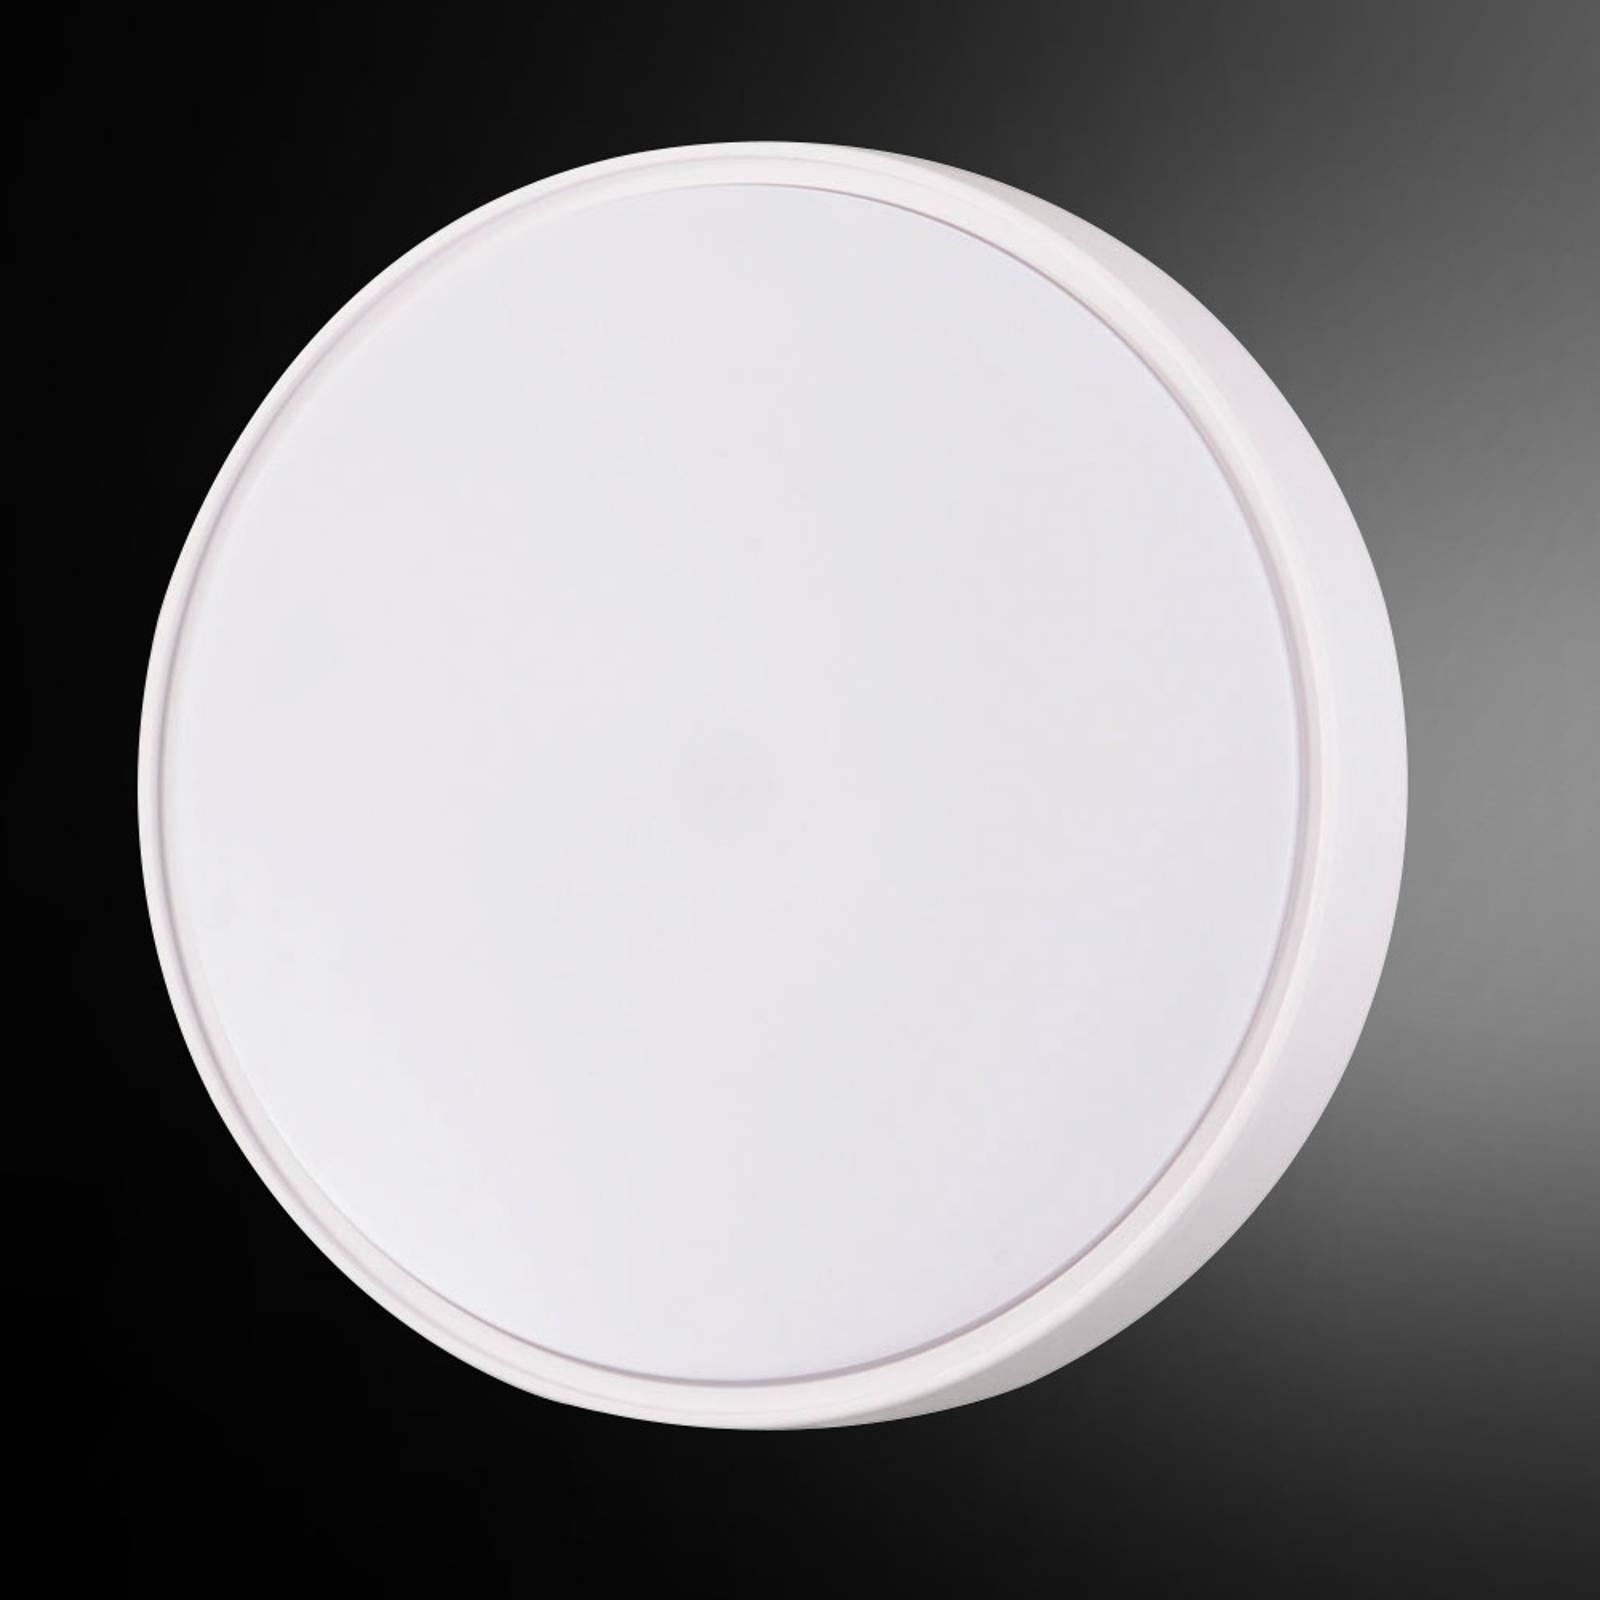 LED-taklampe Hatton IP65 30cm med godt lys